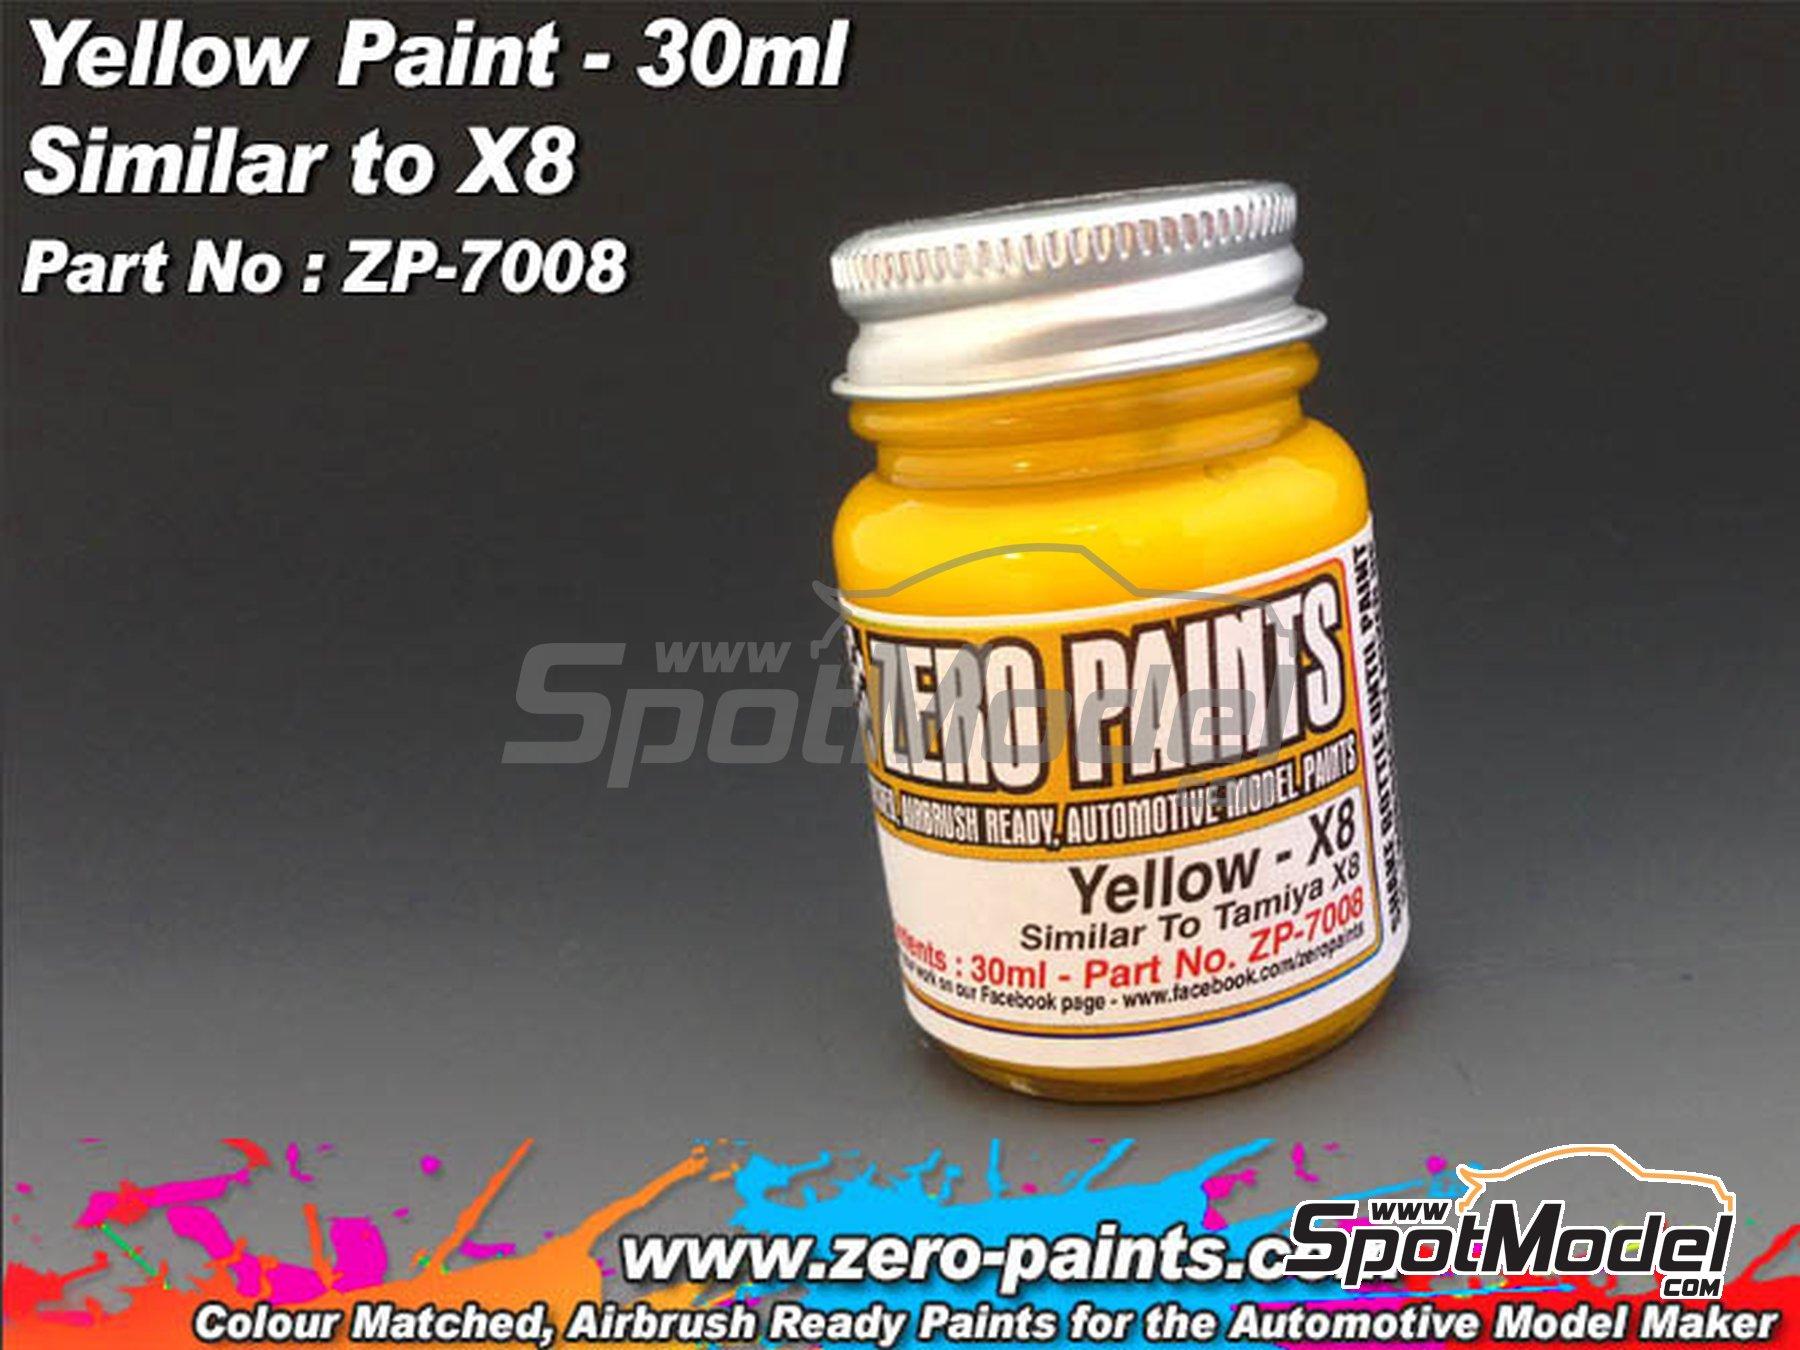 Image 1: Amarillo - Yellow - Similar a Tamiya X-8 - 1 x 30ml | Pintura fabricado por Zero Paints (ref.ZP-7008)